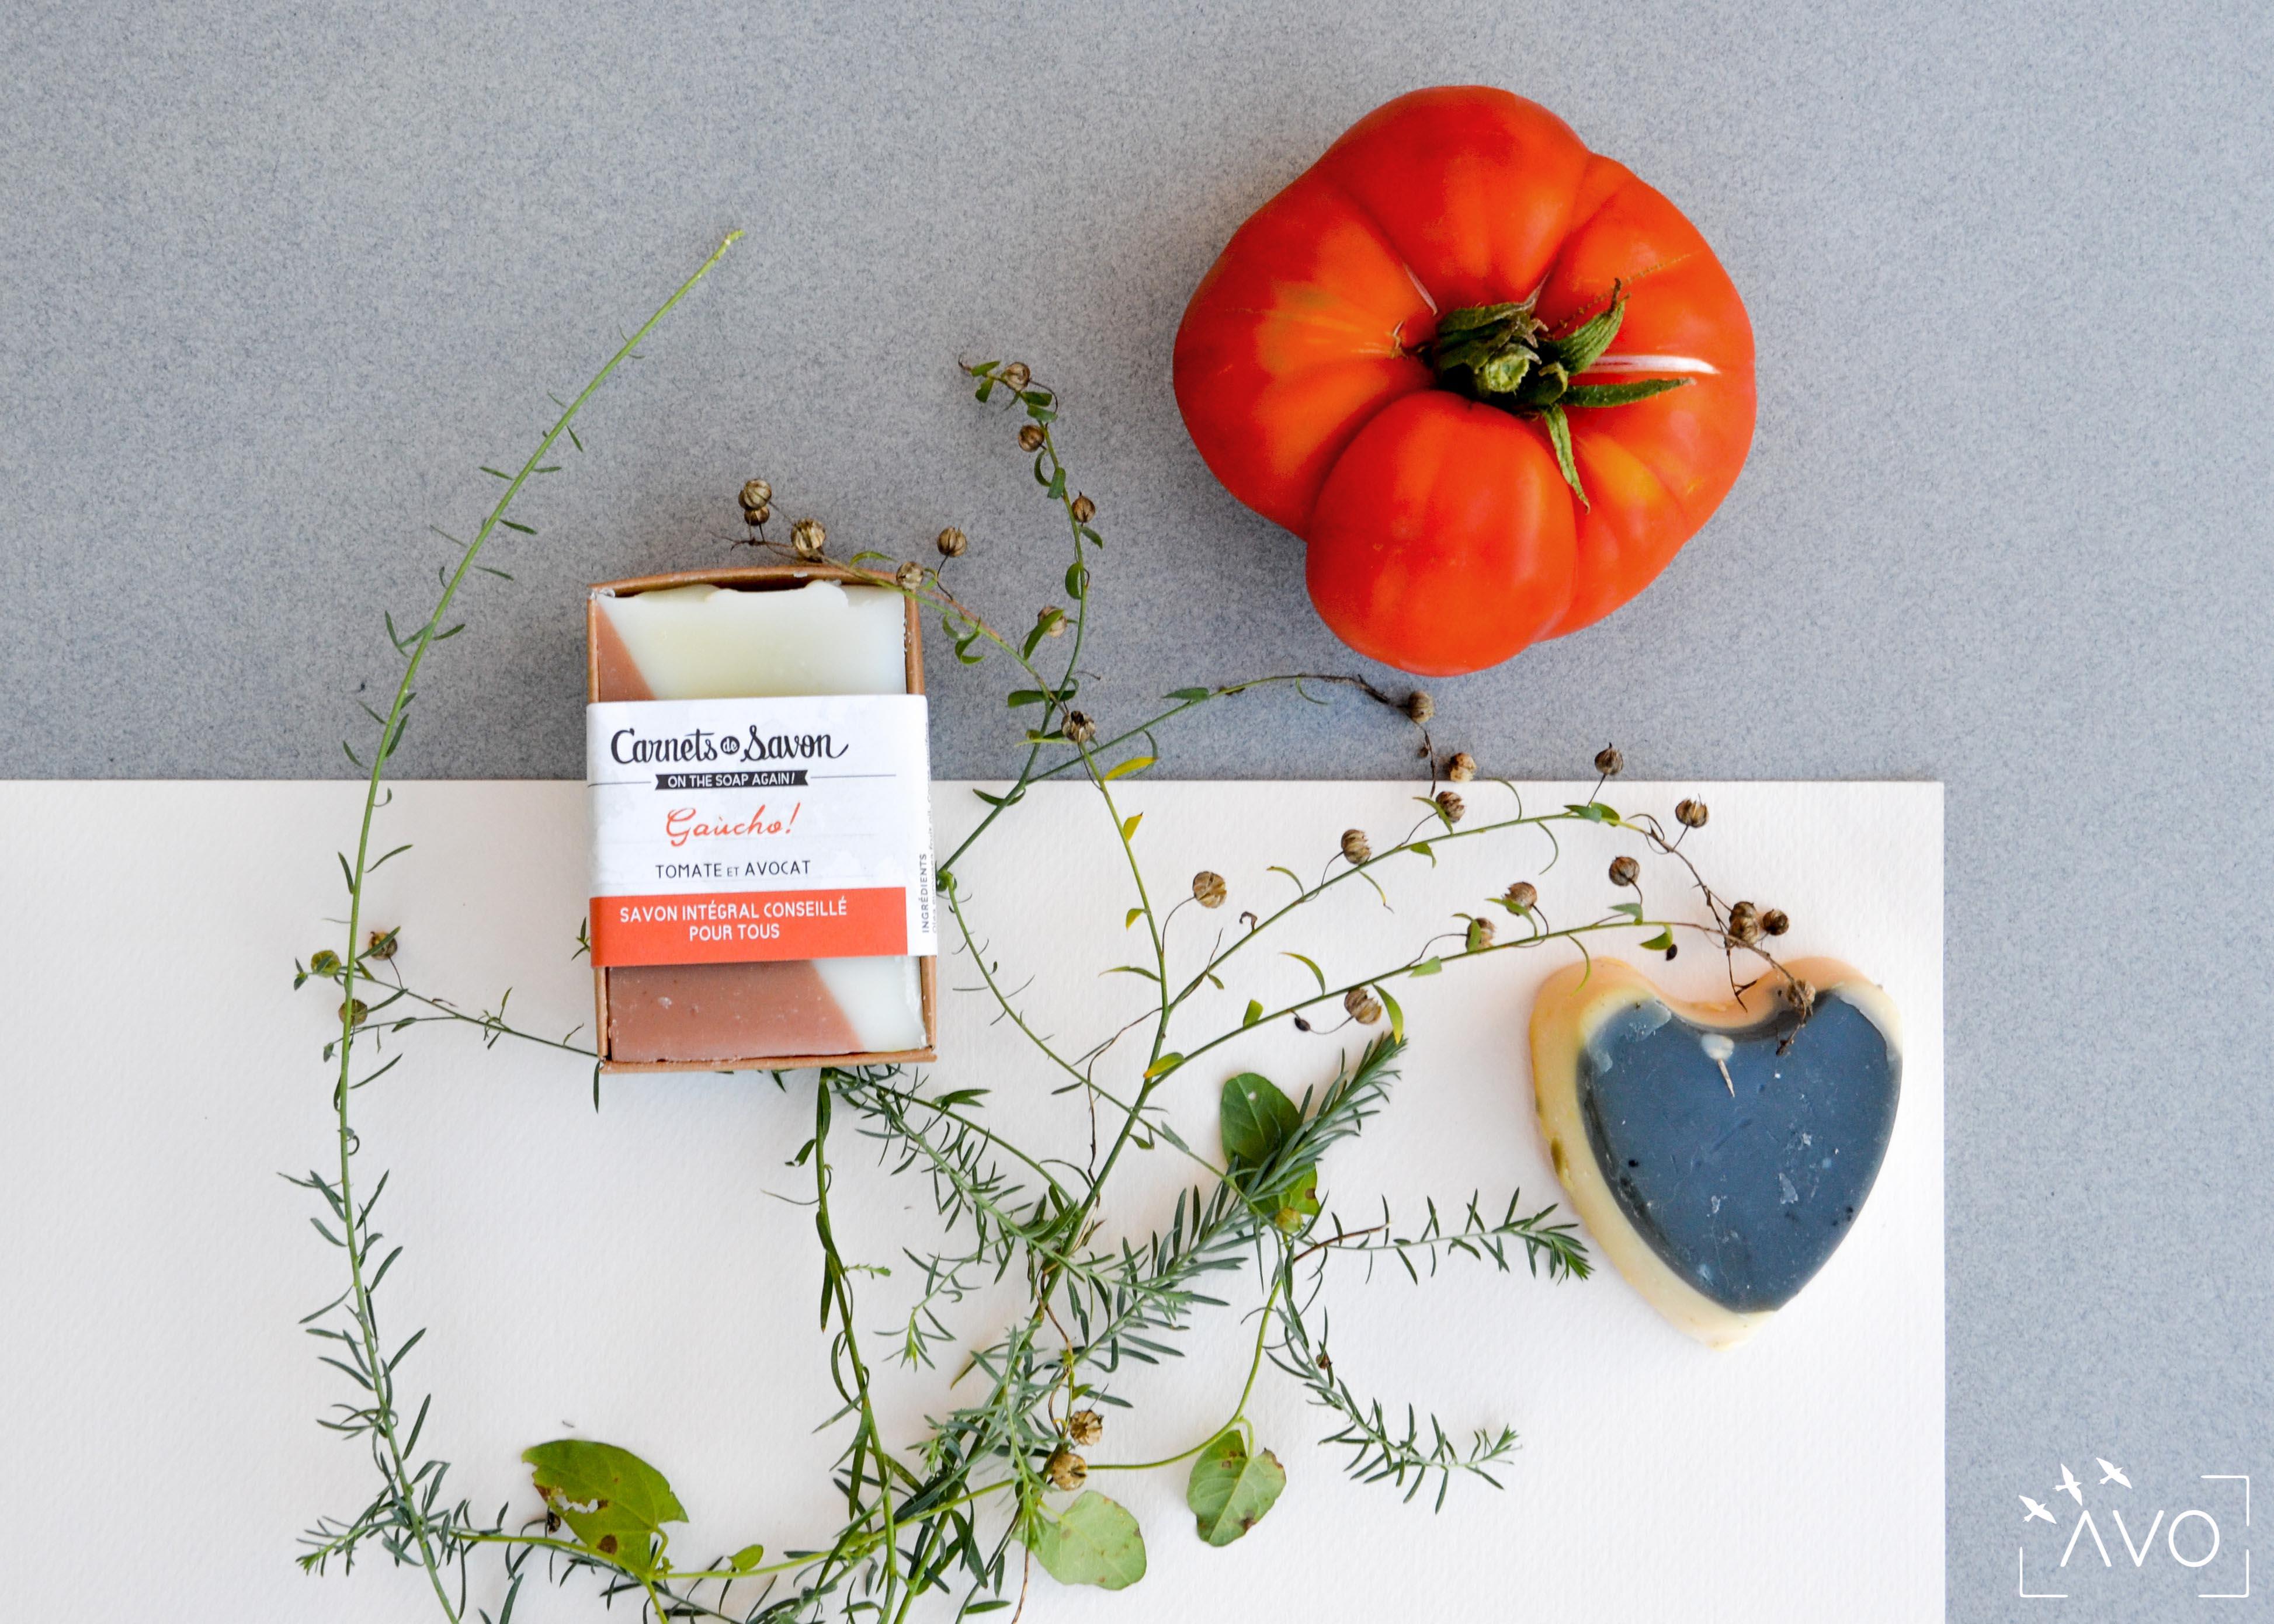 savons naturels avo ecologie savon cosmétique naturel carnets de savon gaucho